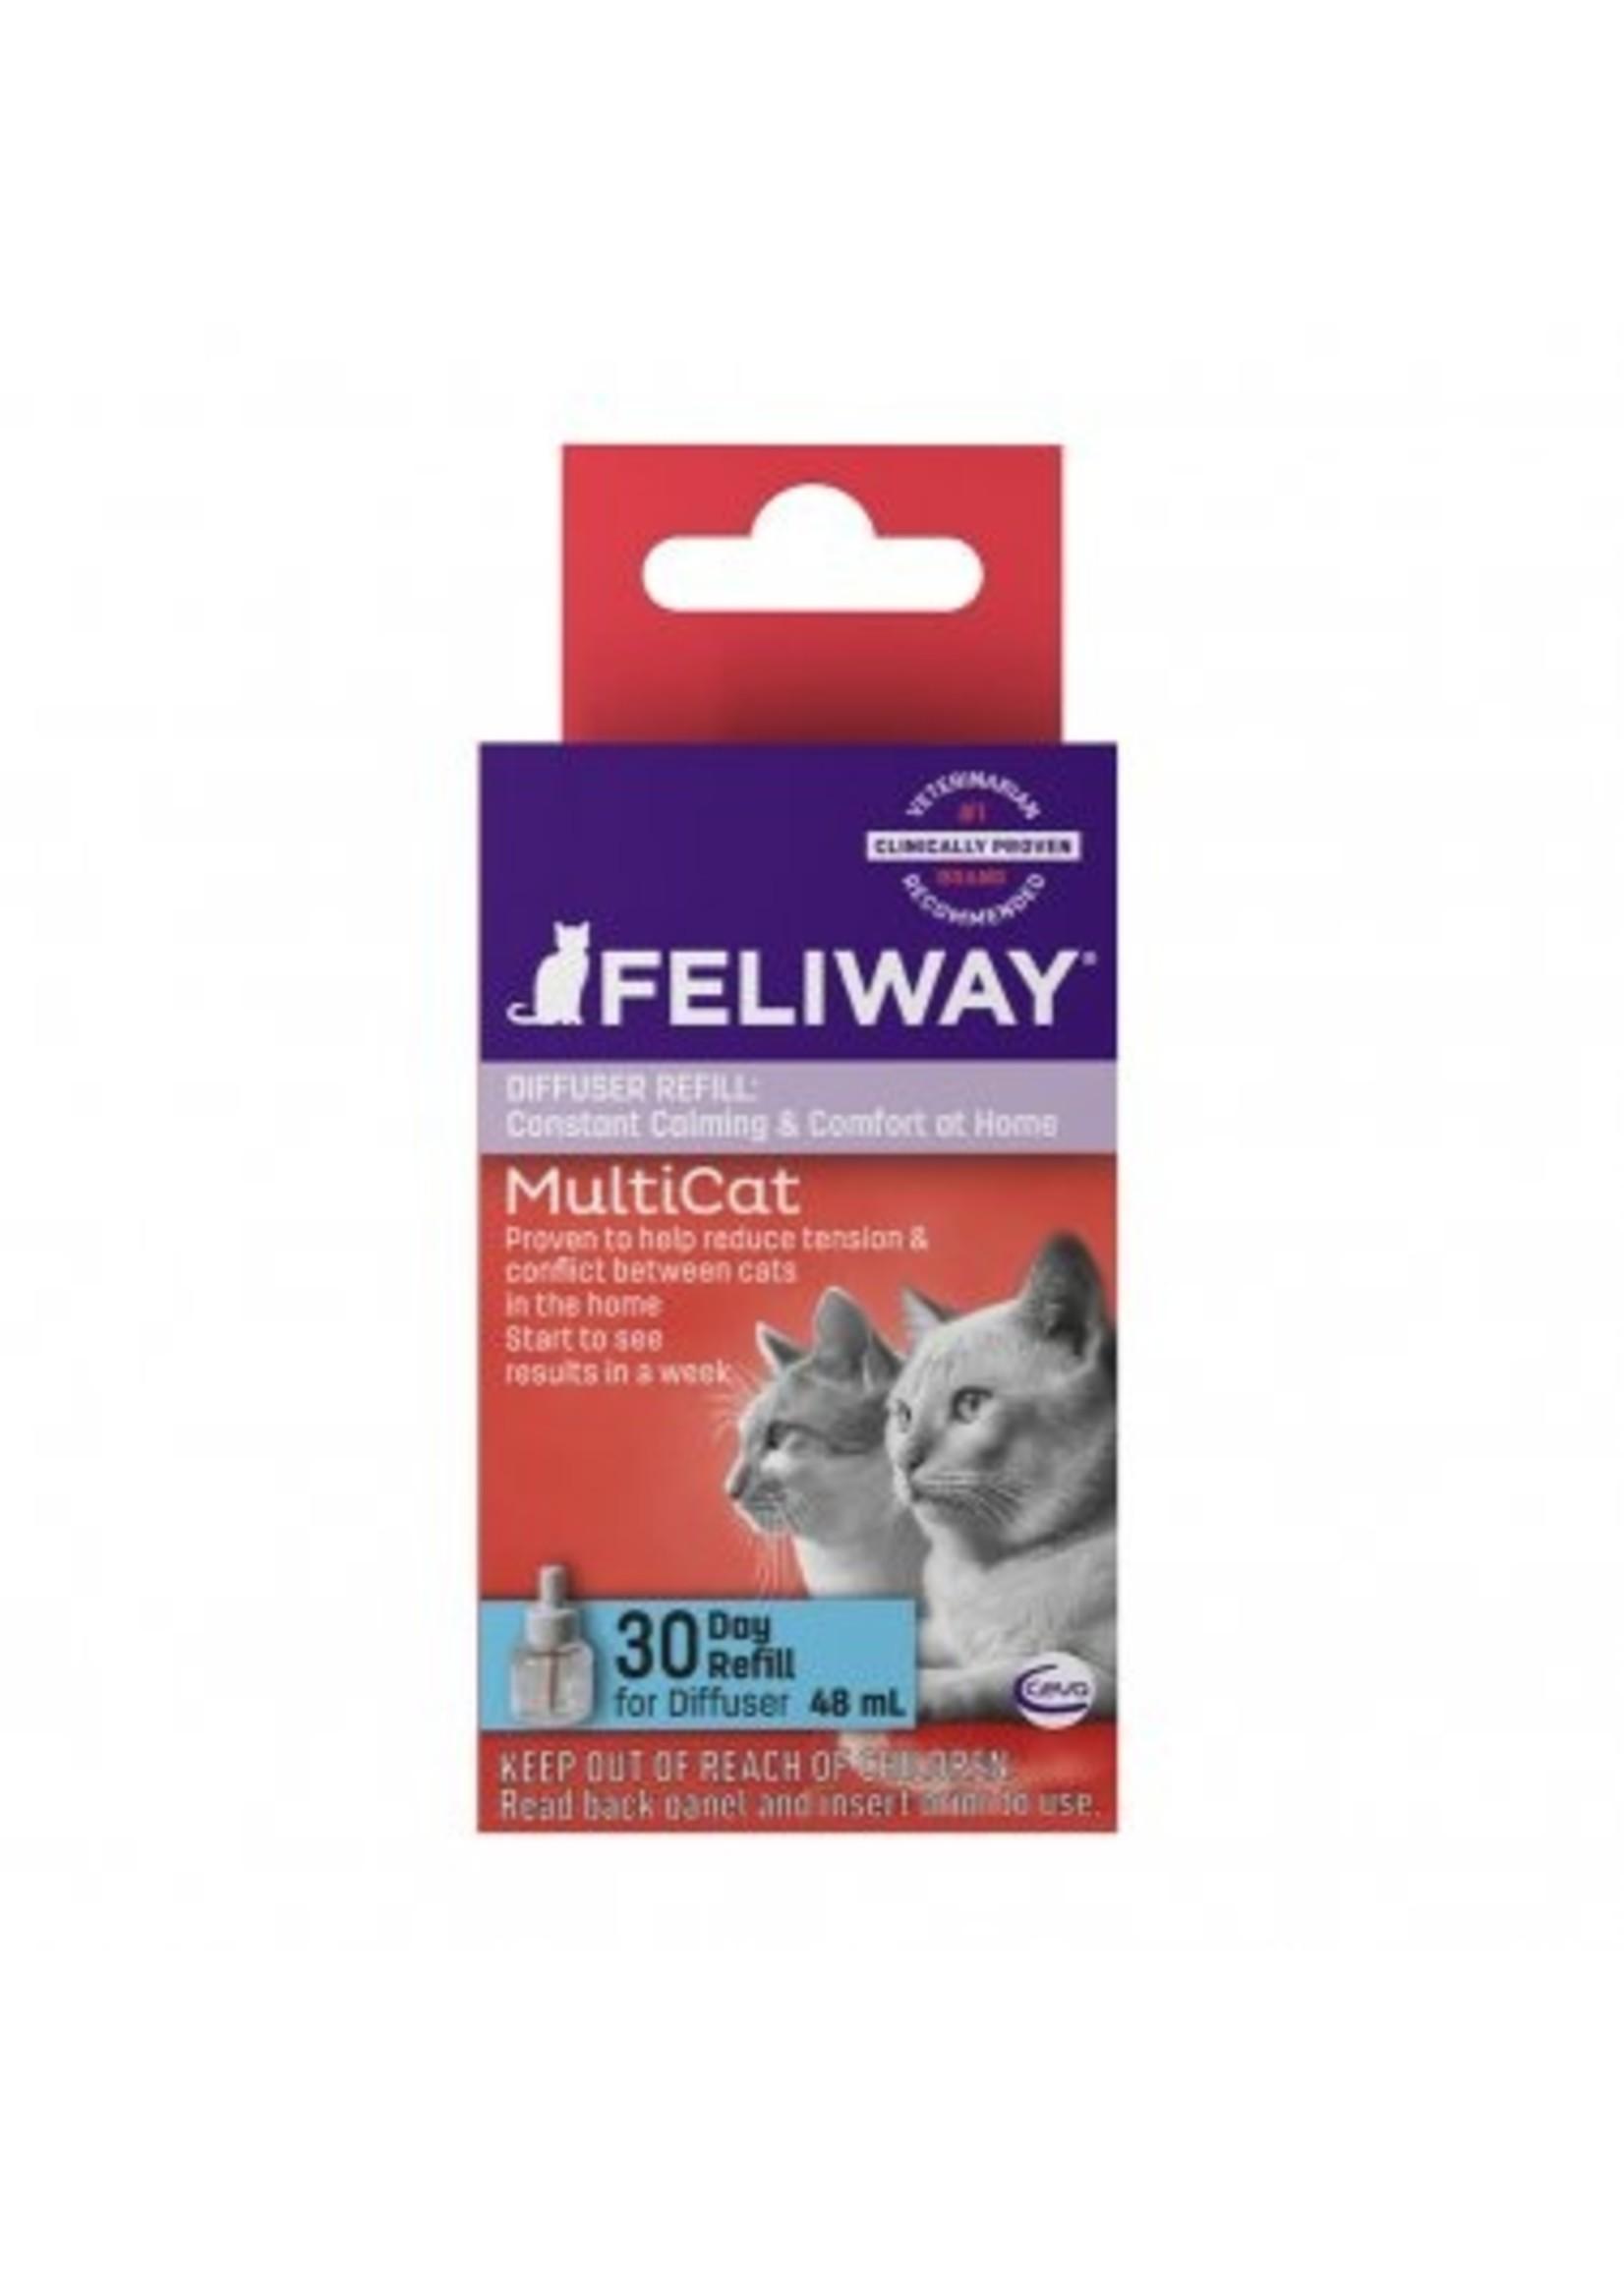 Feliway Feliway MultiCat Diffuser Refill